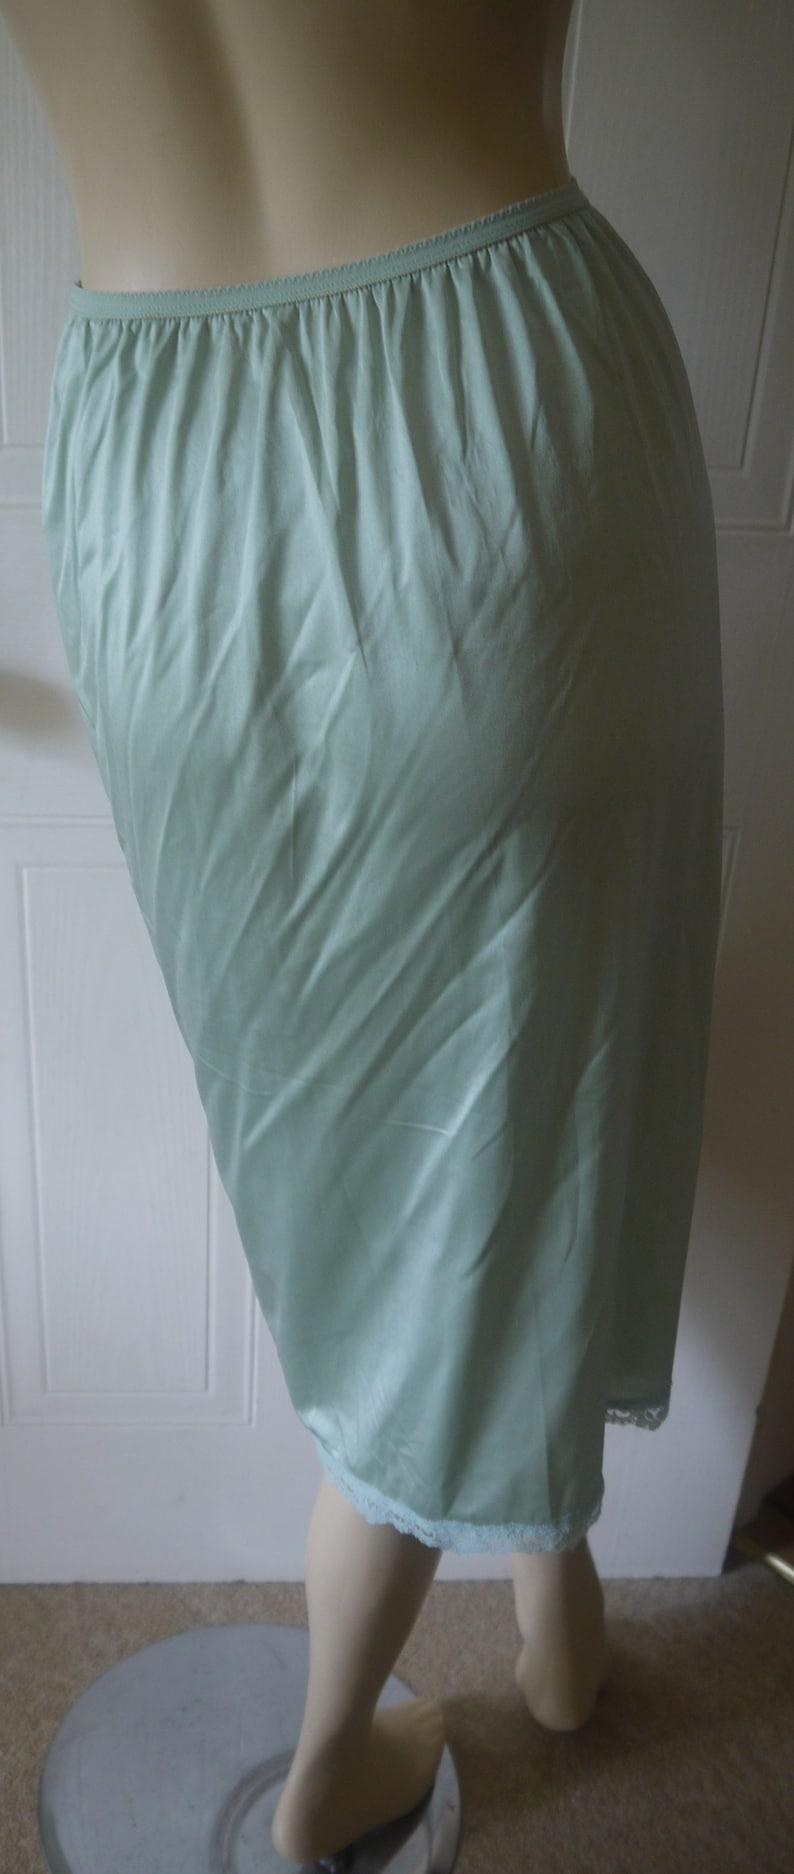 Vintage St Michael silky nylon green half slip underskirt waist slip petticoat size 10~12